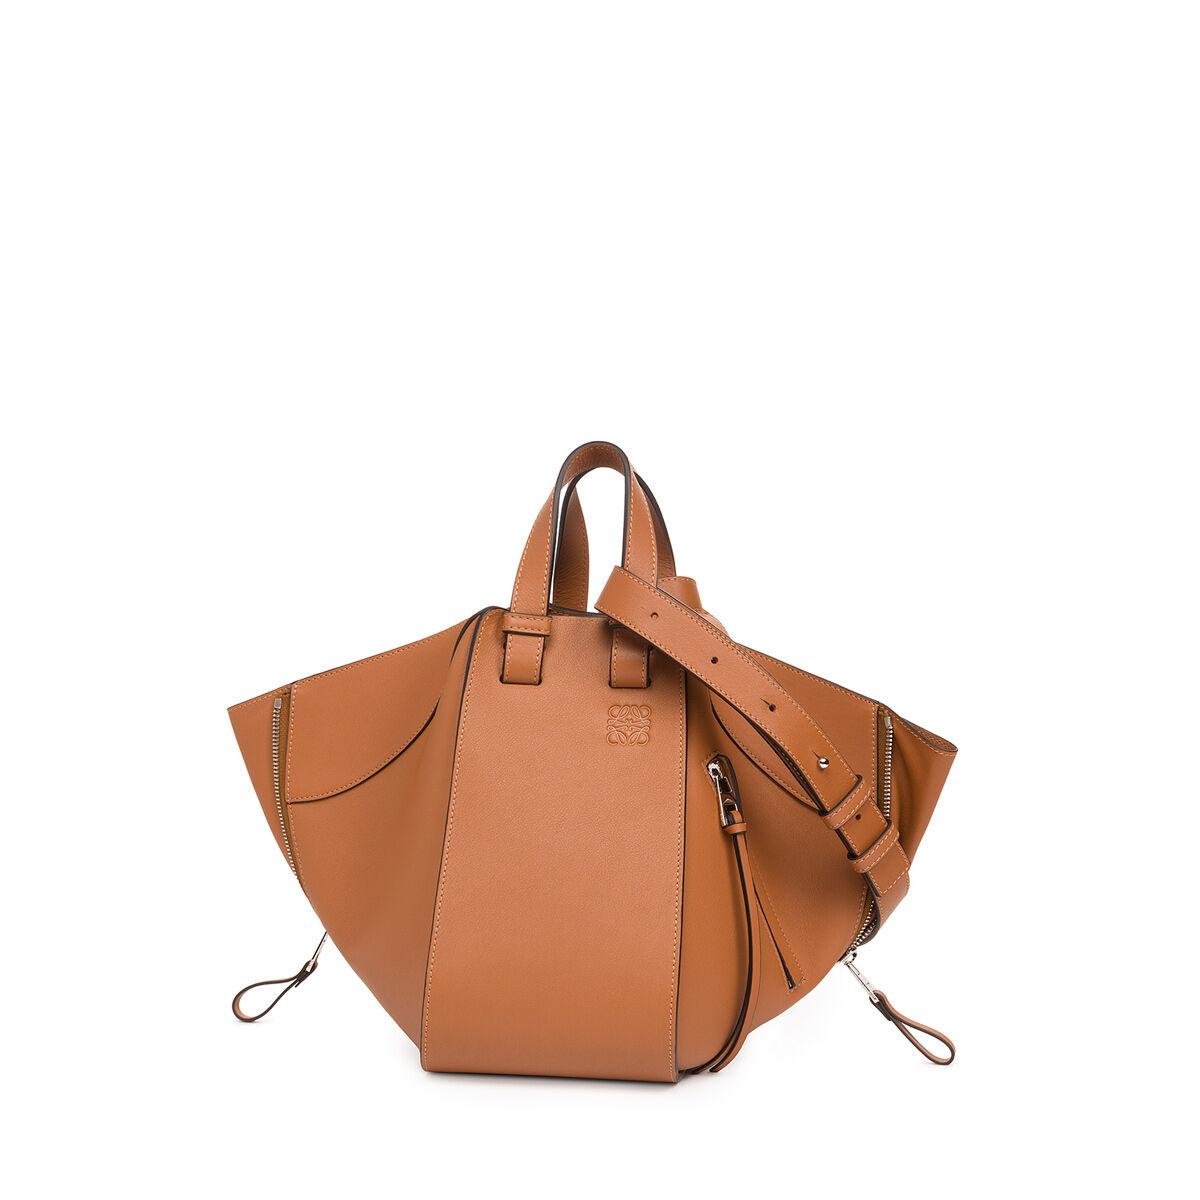 LOEWE Hammock Small Bag 棕色 all